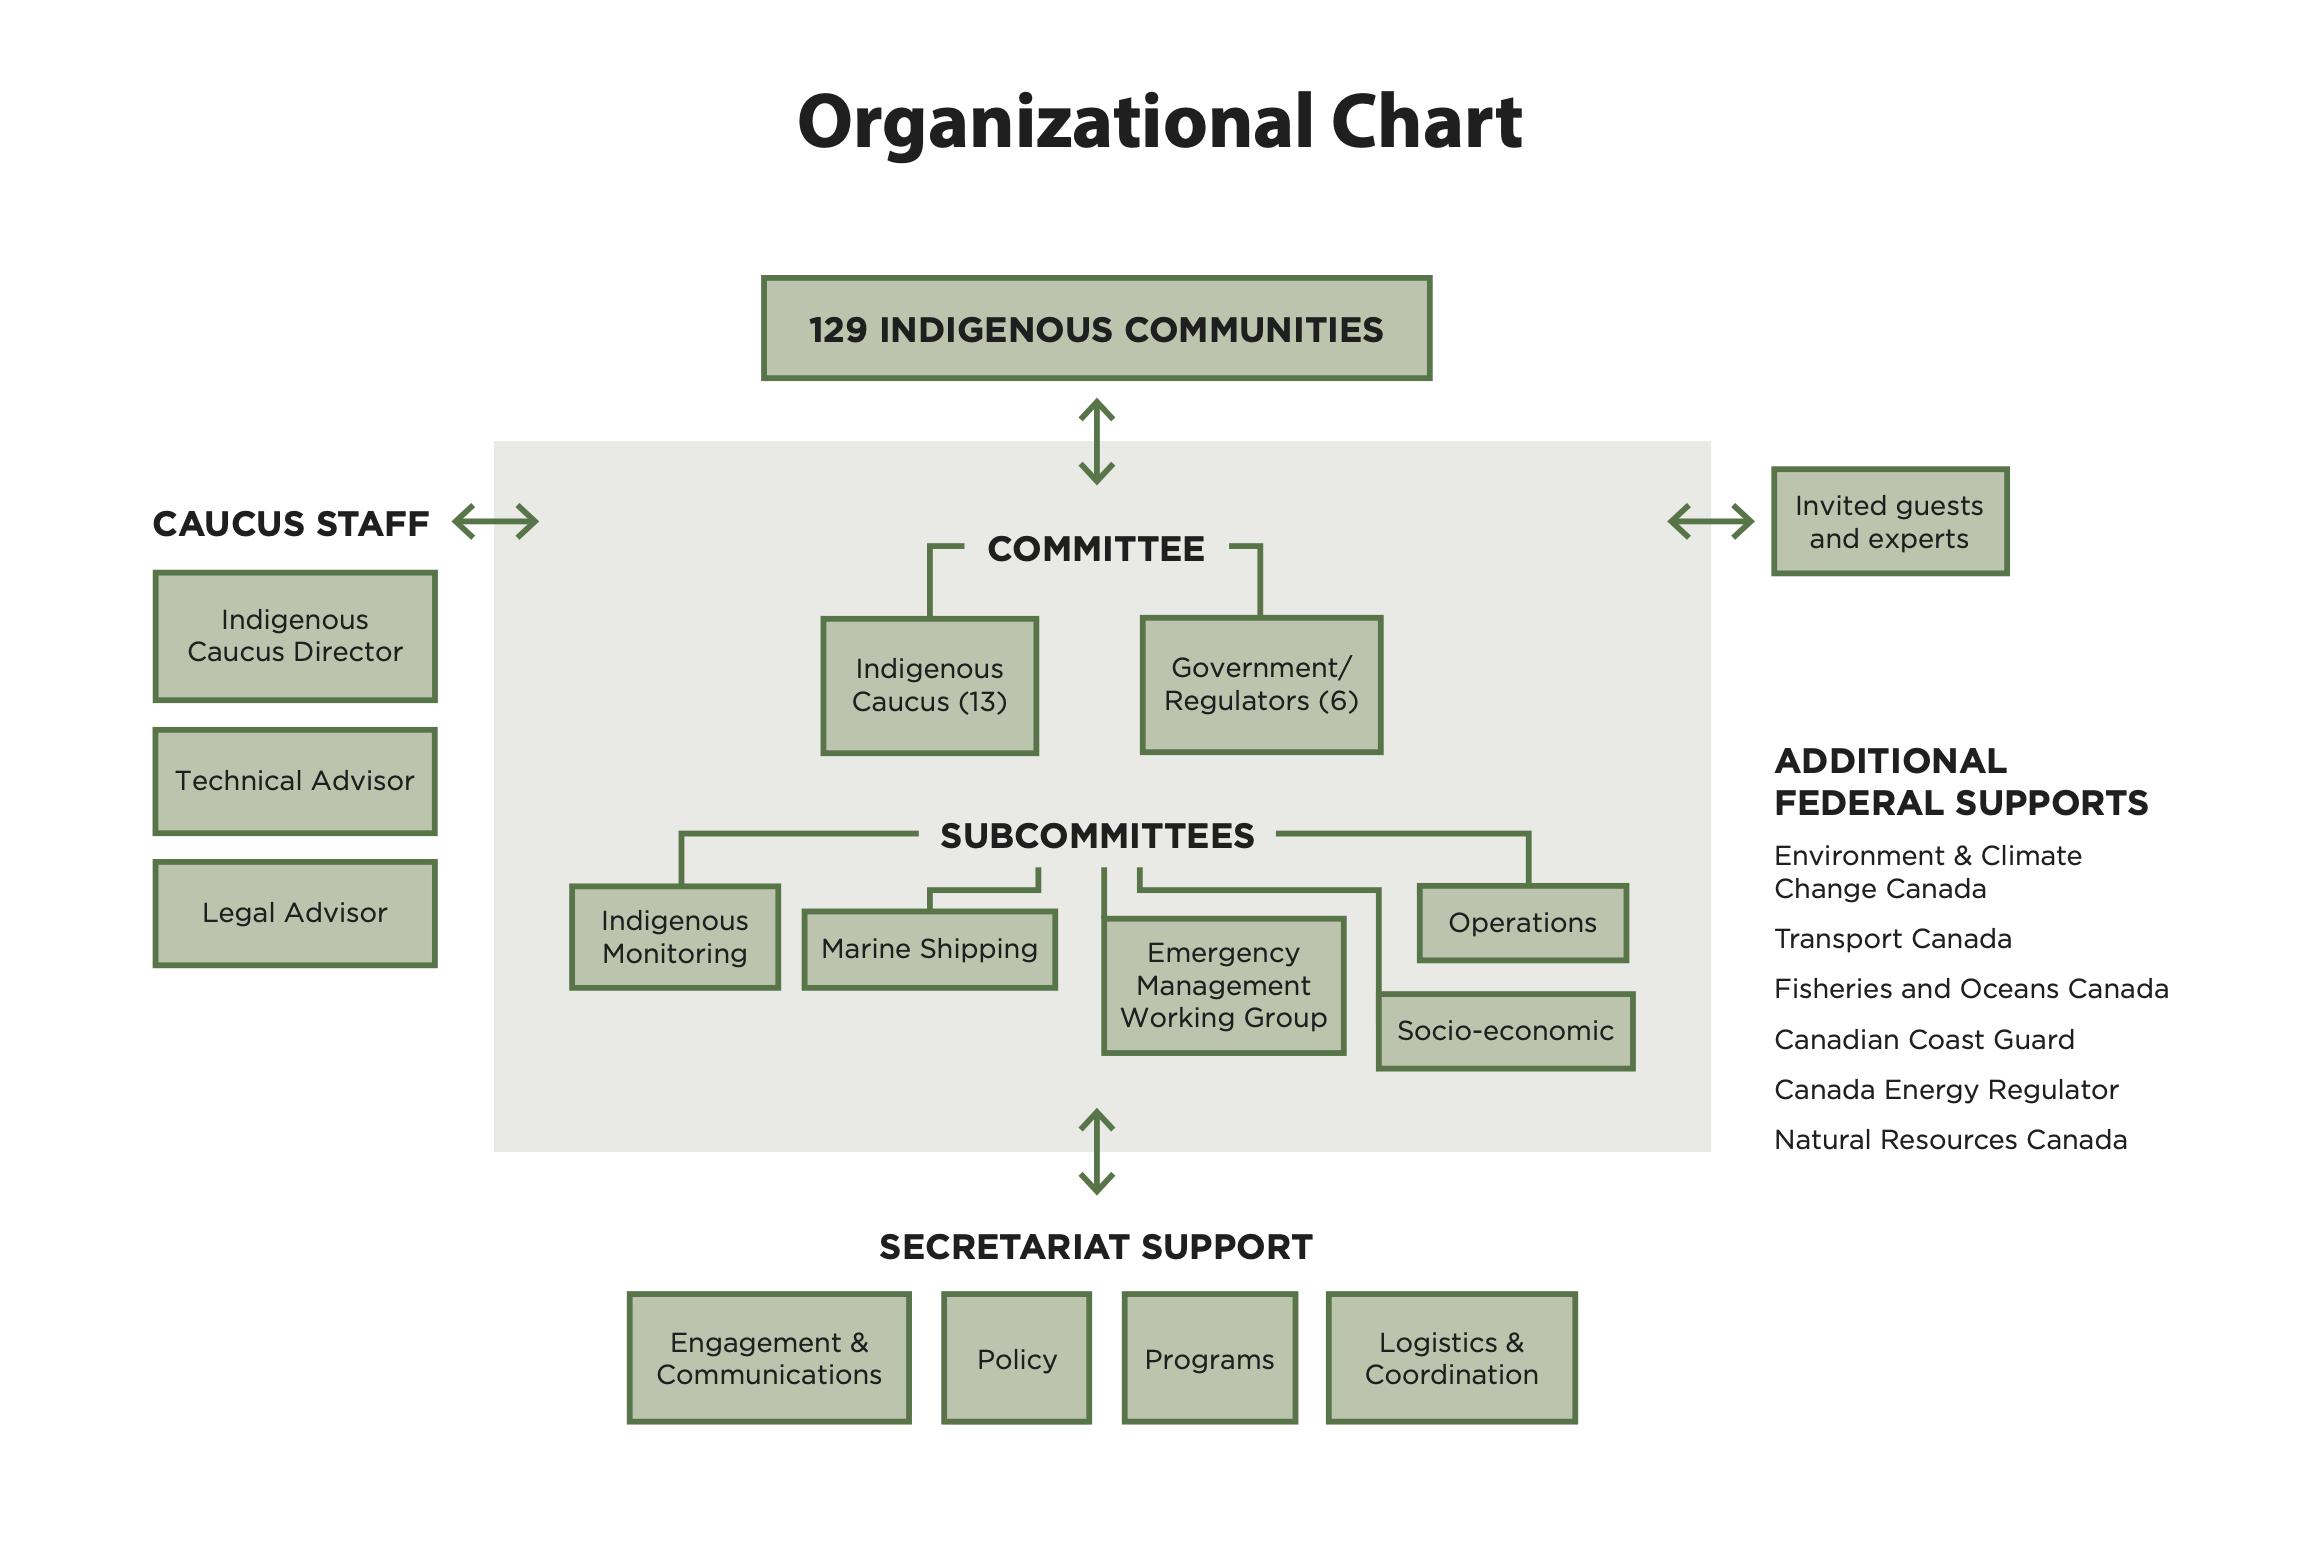 IAMC_AR-Organizational Chart-2